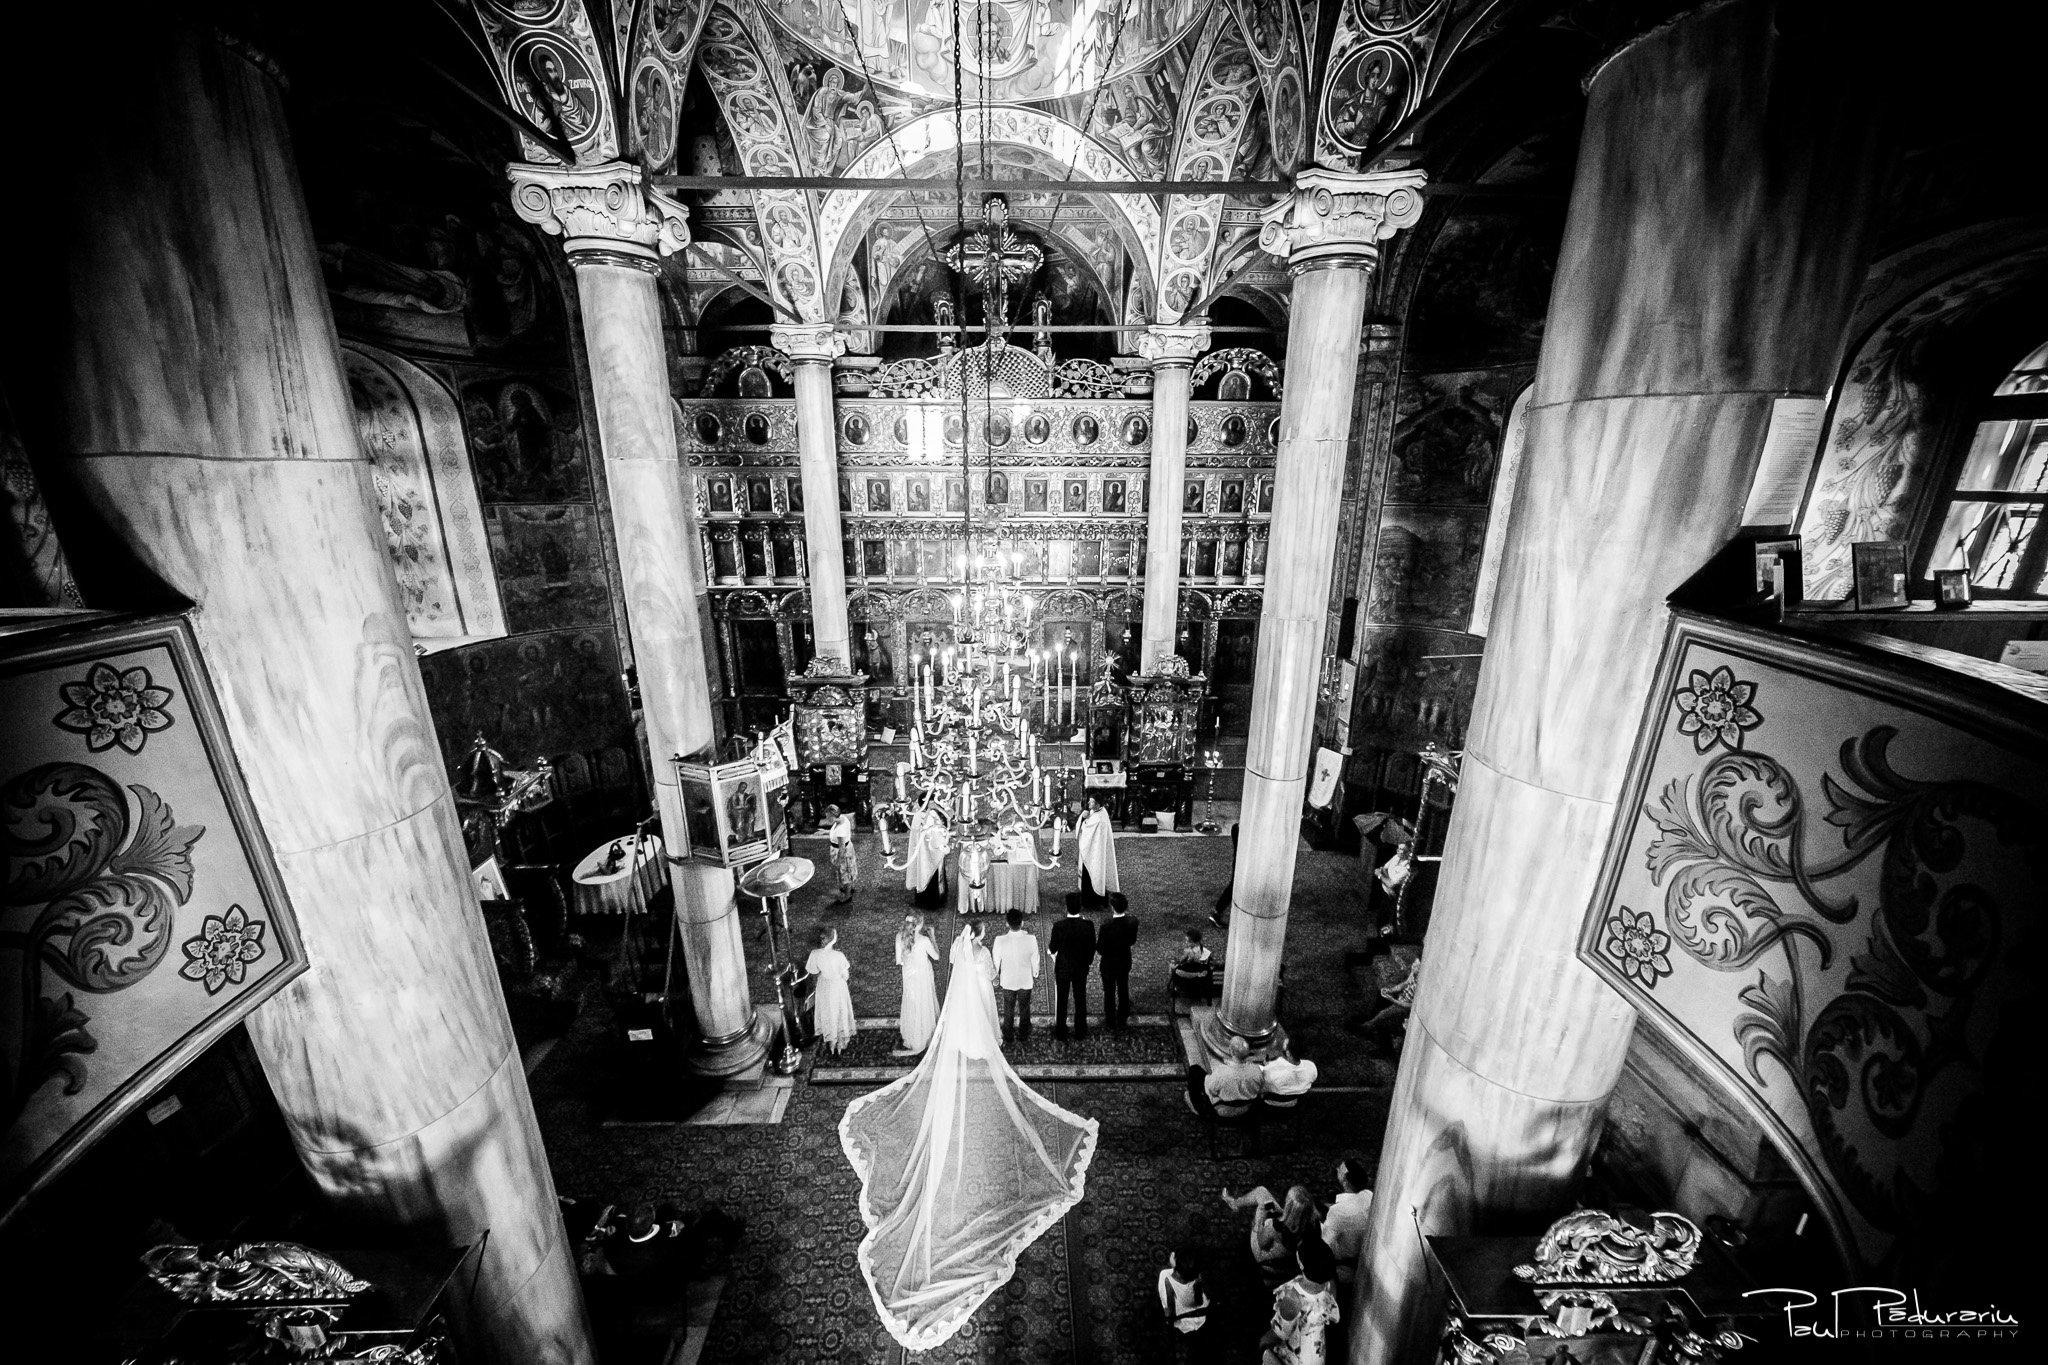 Cununia religioasa nunta Ema si Tudor fotograf de nunta iasi www.paulpadurariu.ro © 2017 Paul Padurariu miri vedere de sus in biserica